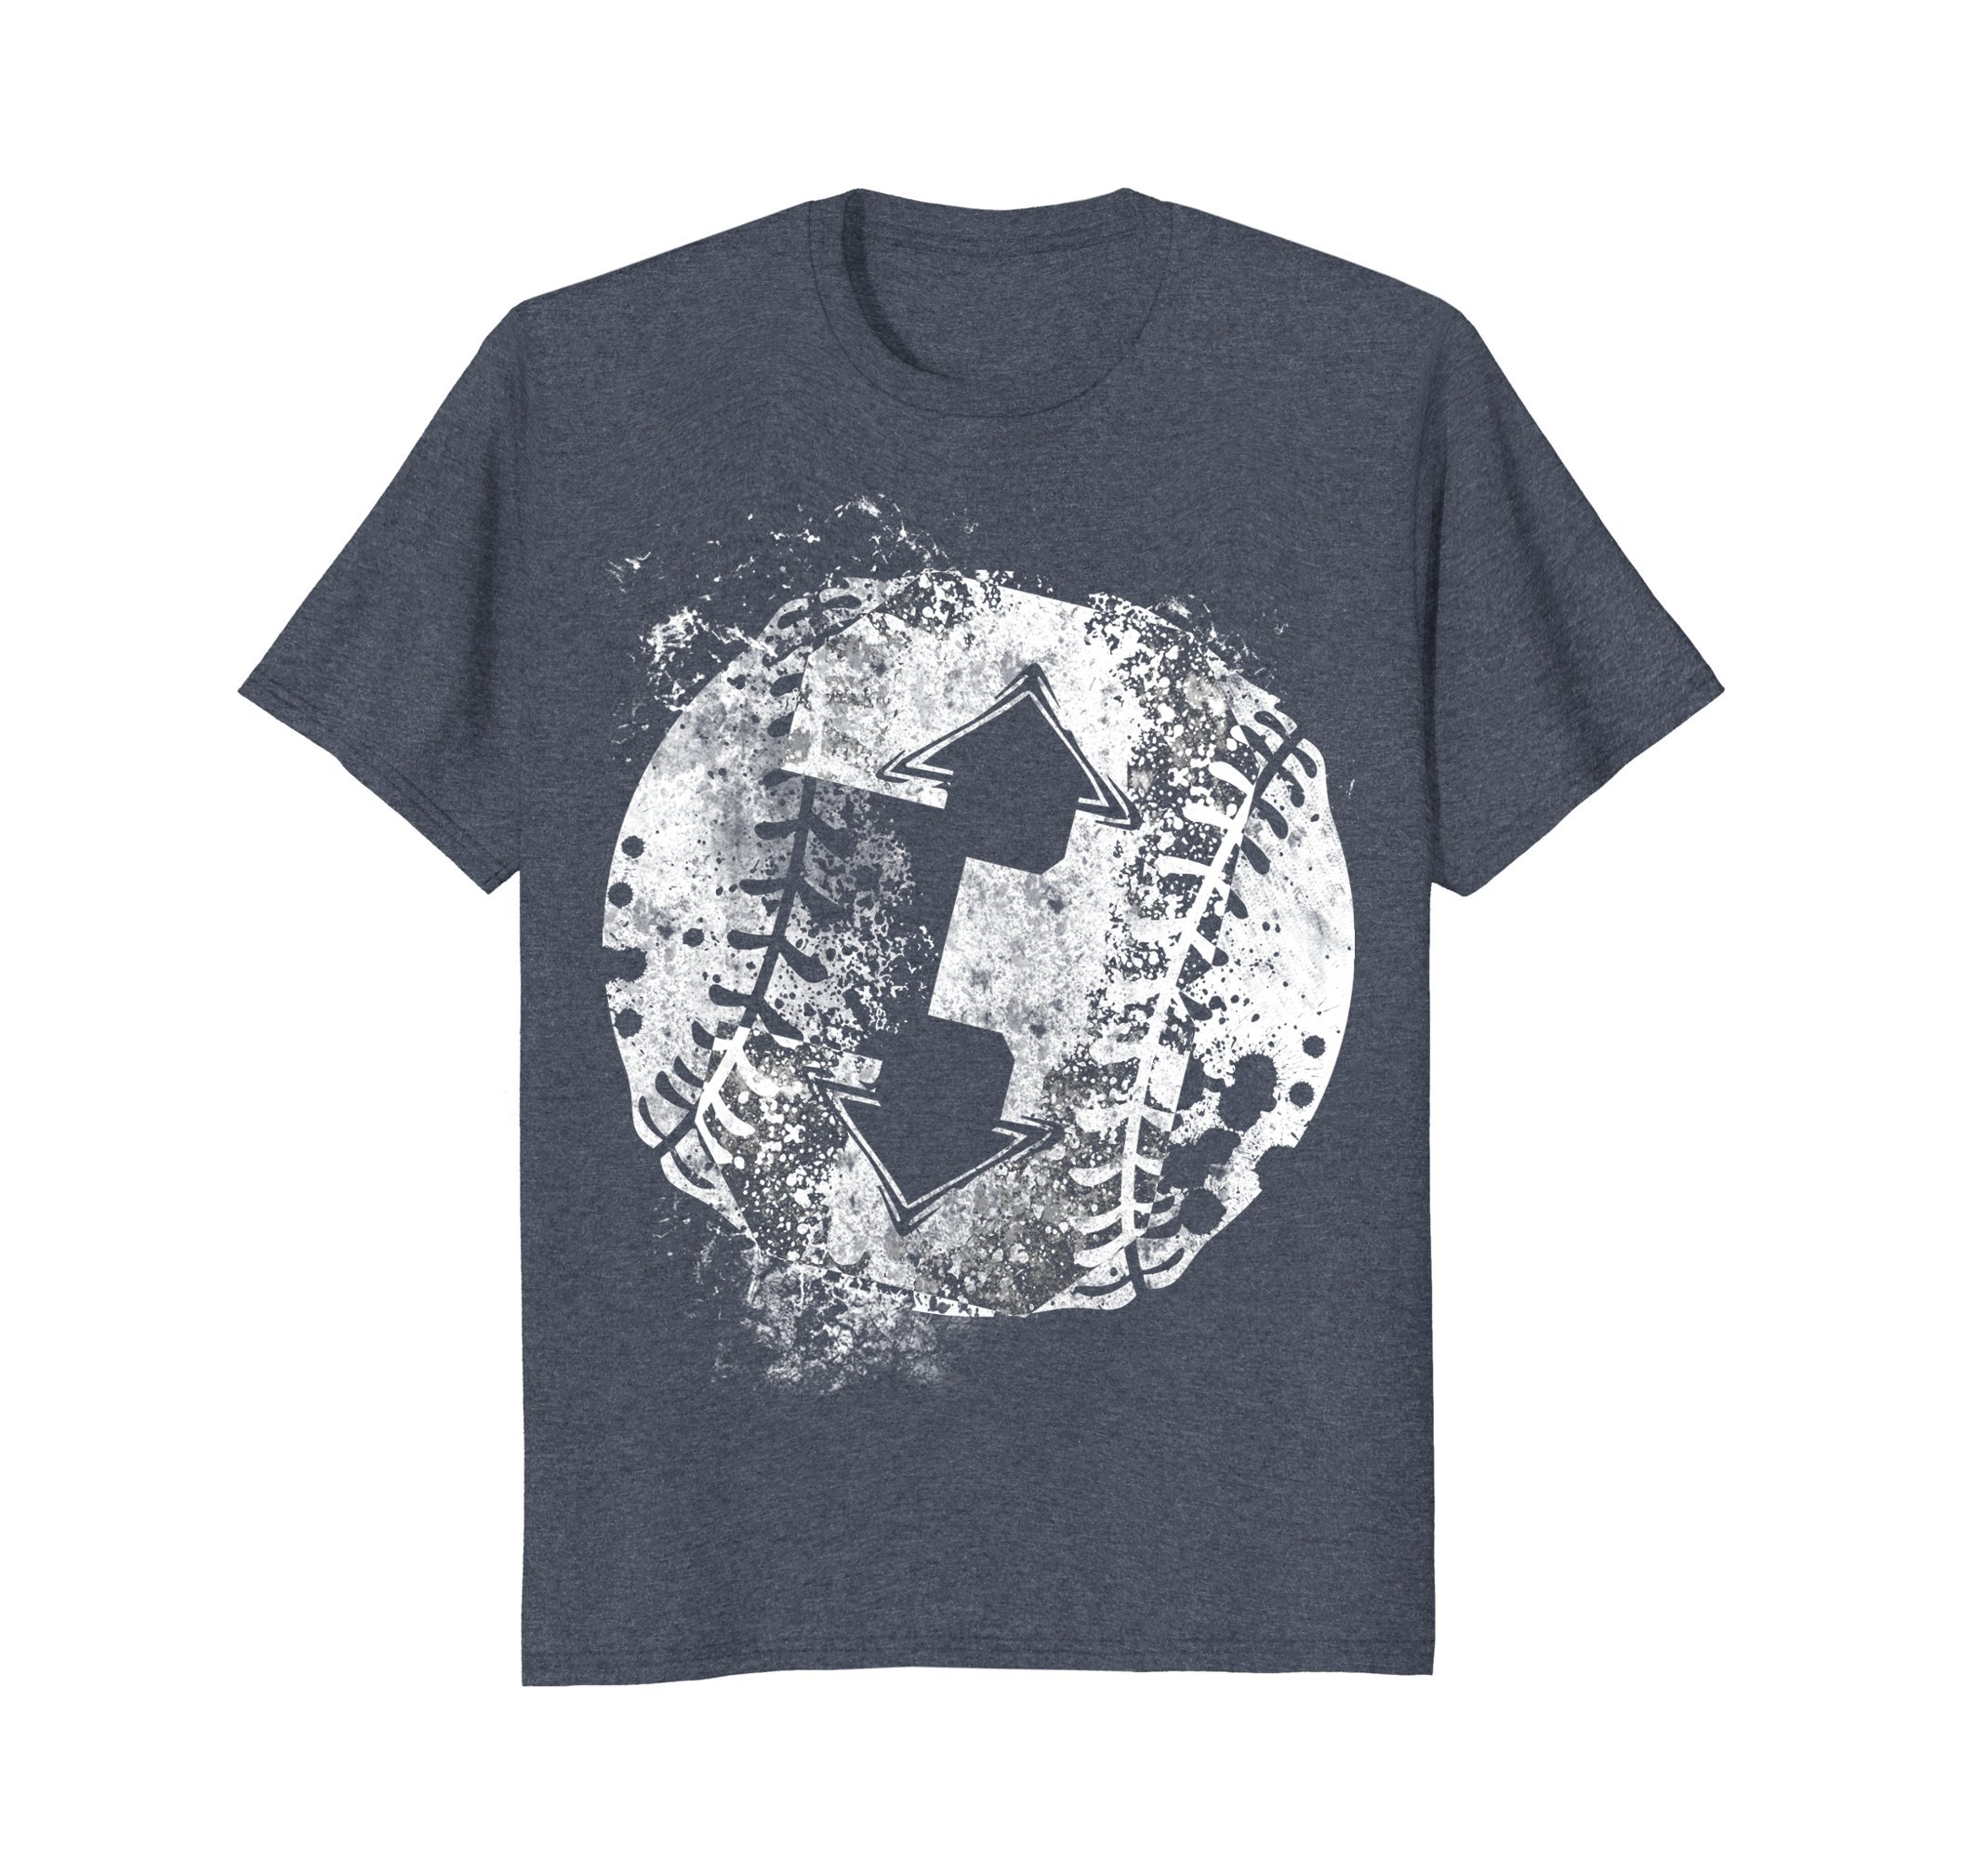 3 Up 3 Down Baseball T Shirt